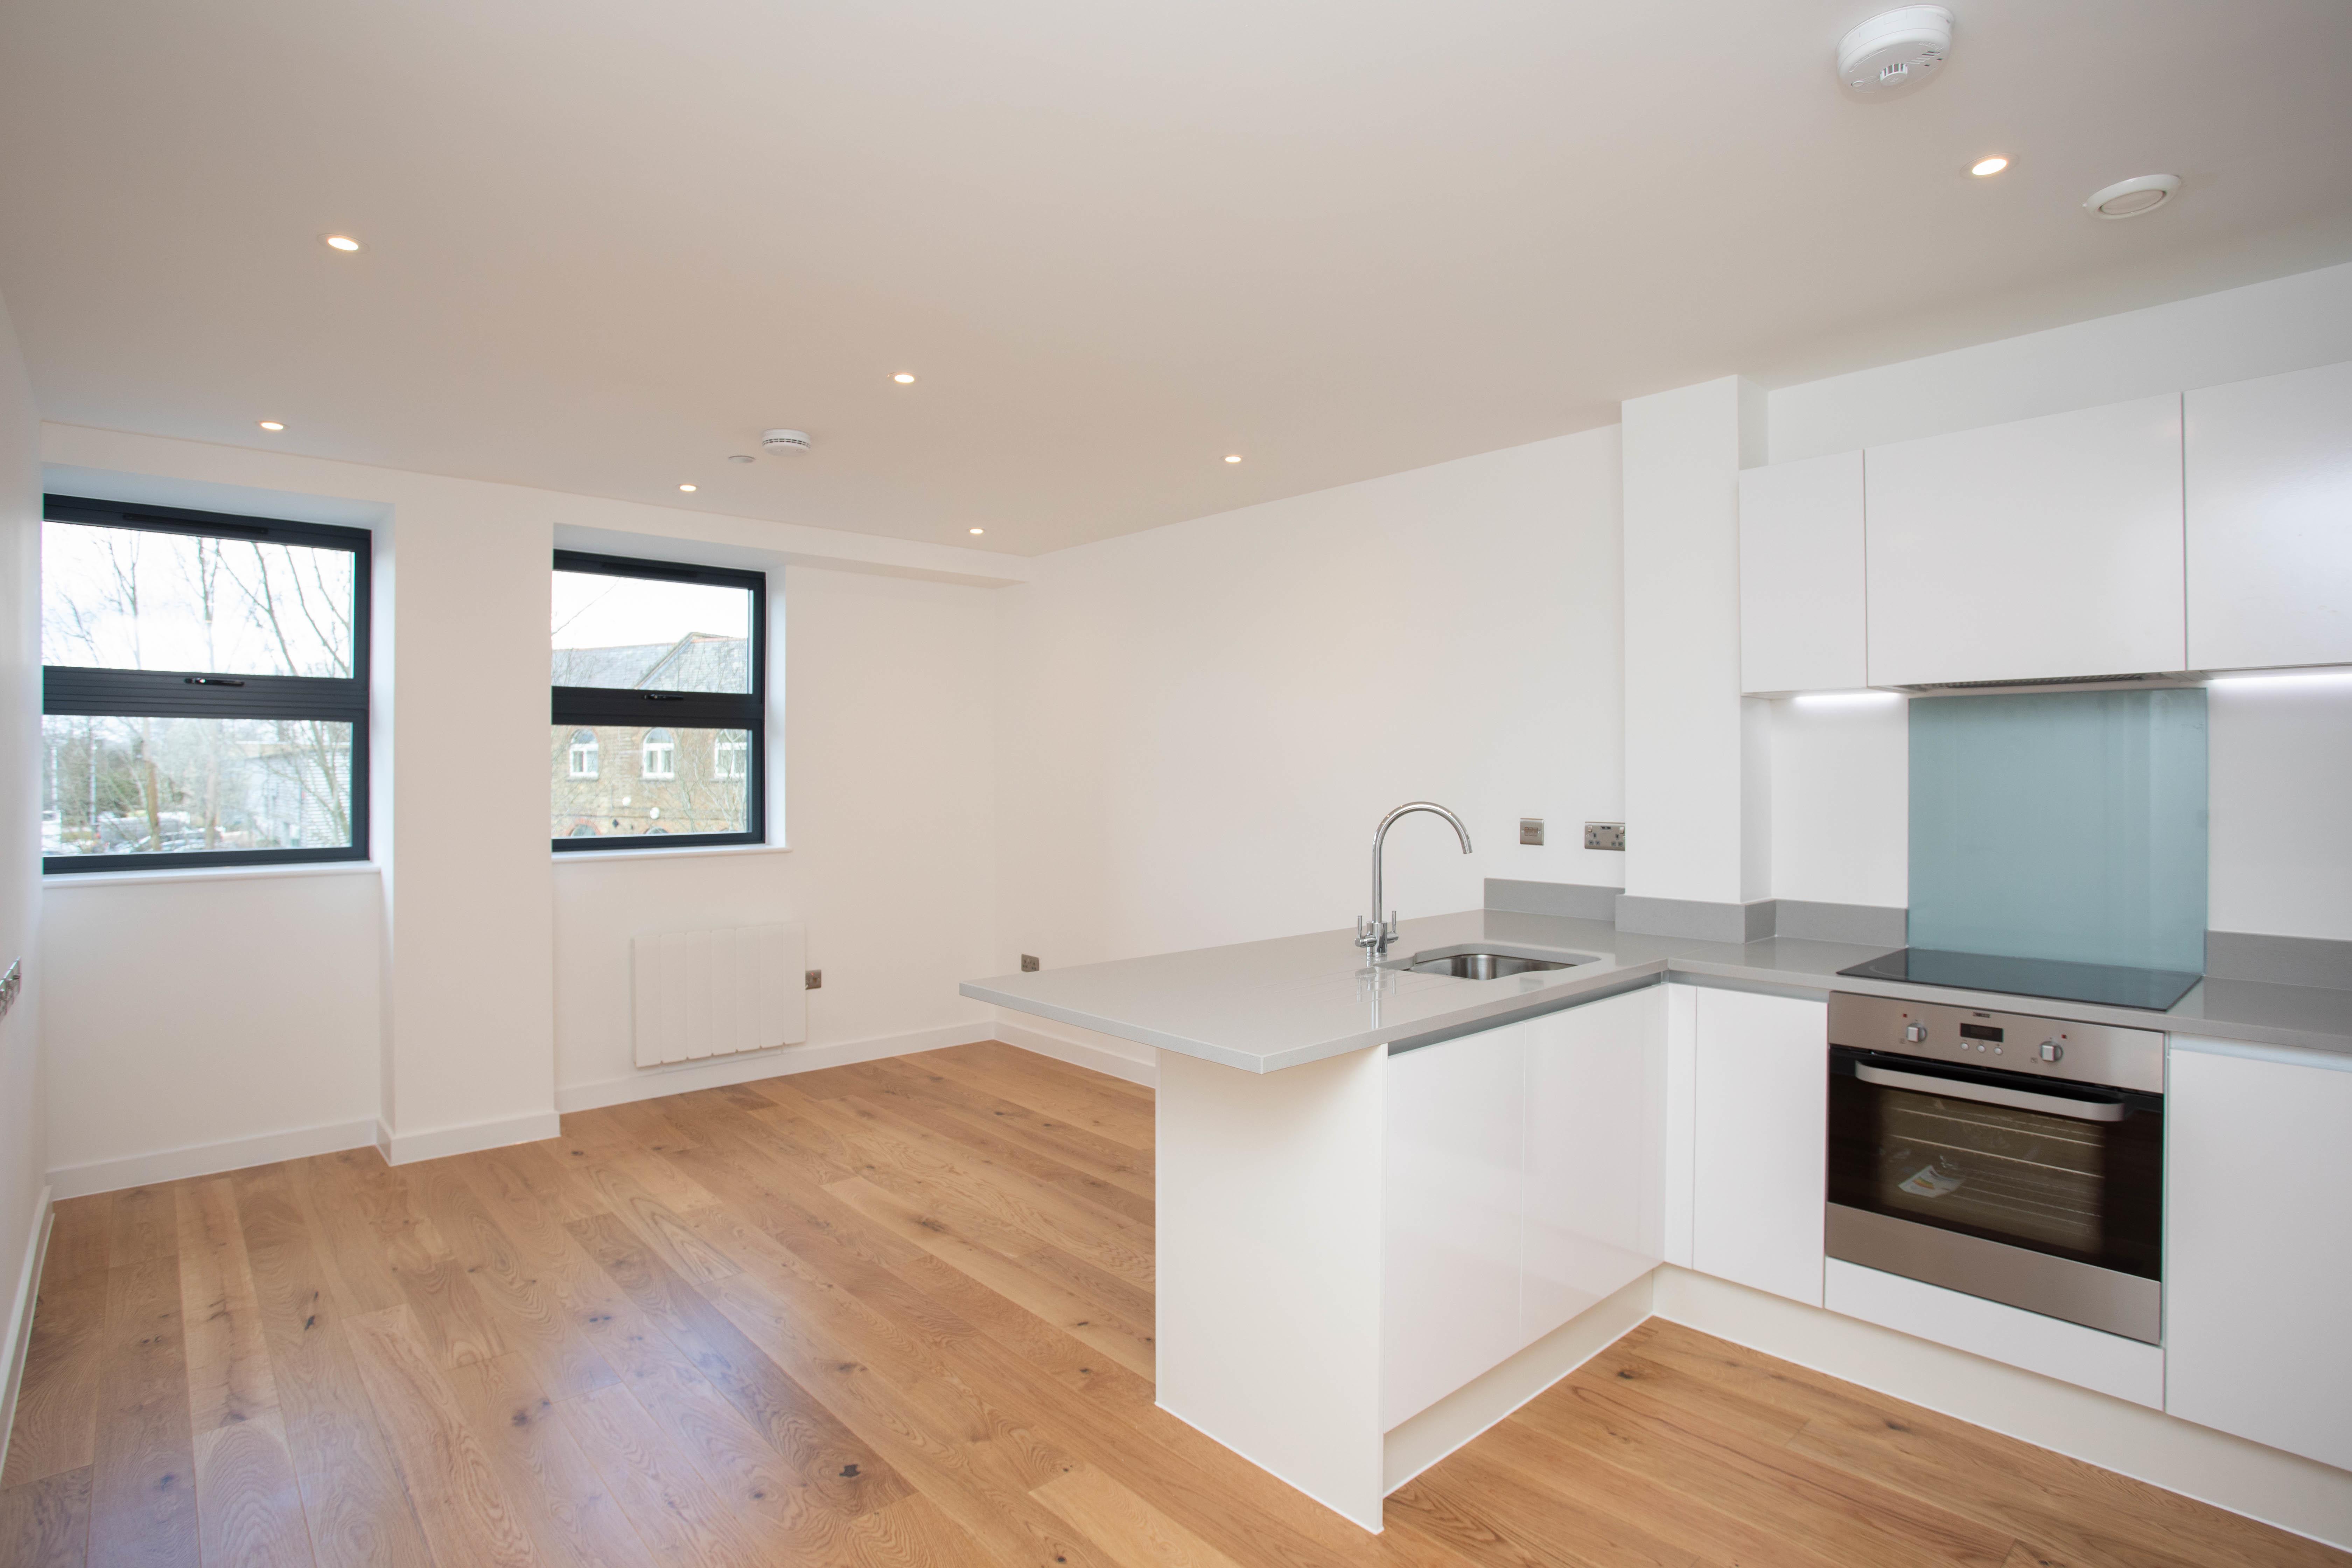 0903202032 rent flat 19 dolphin bridge house rockingham road ub8 2xl 003